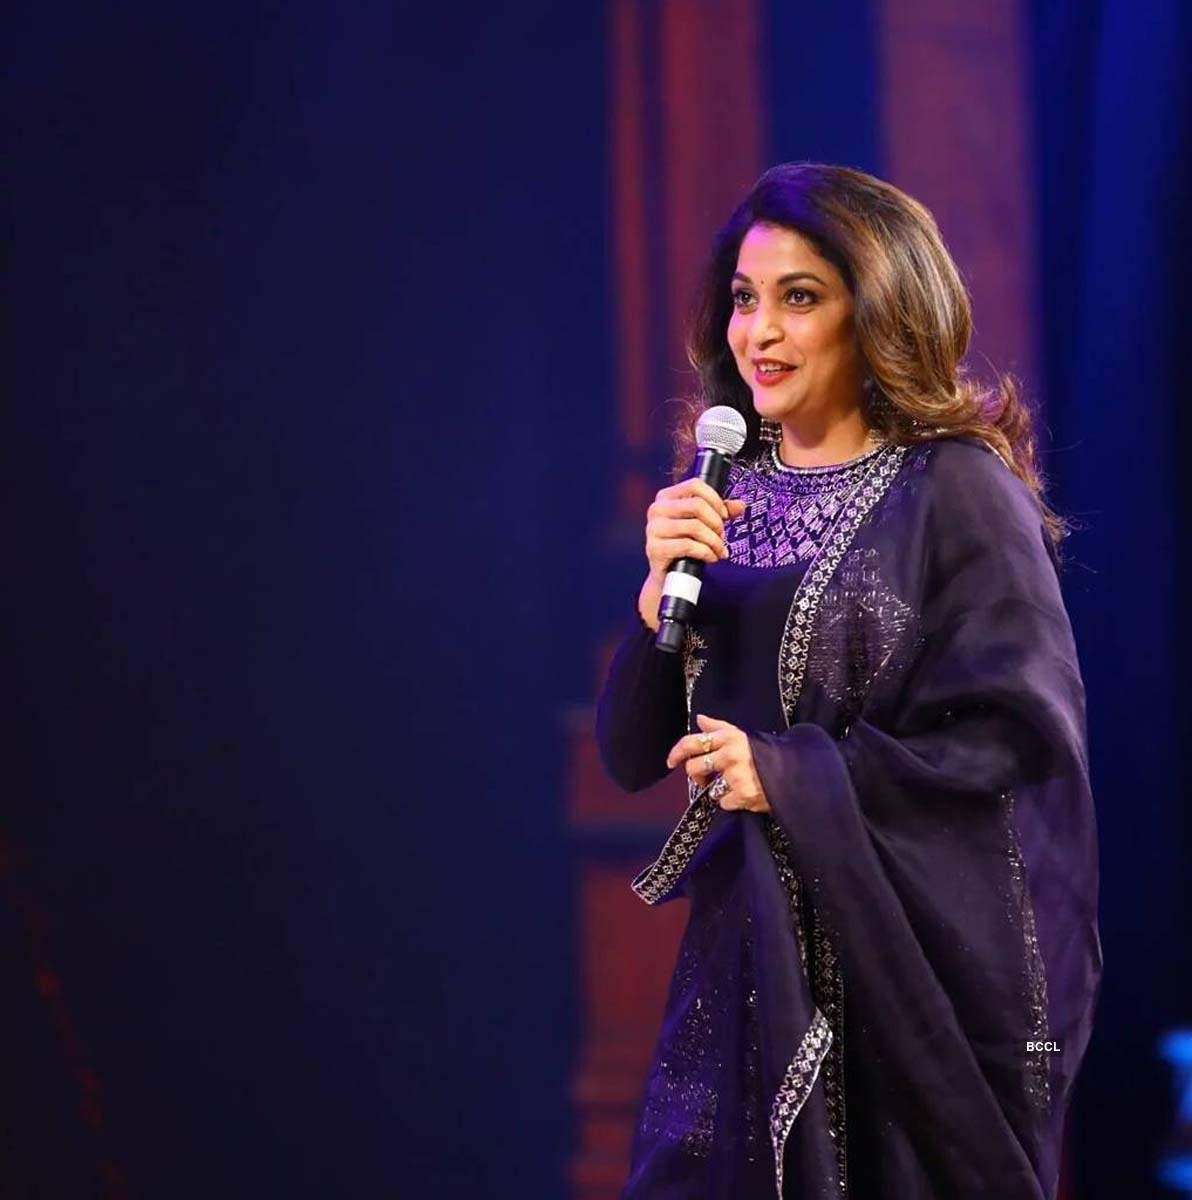 Pictures of gorgeous and versatile actress Ramya Krishnan through the years